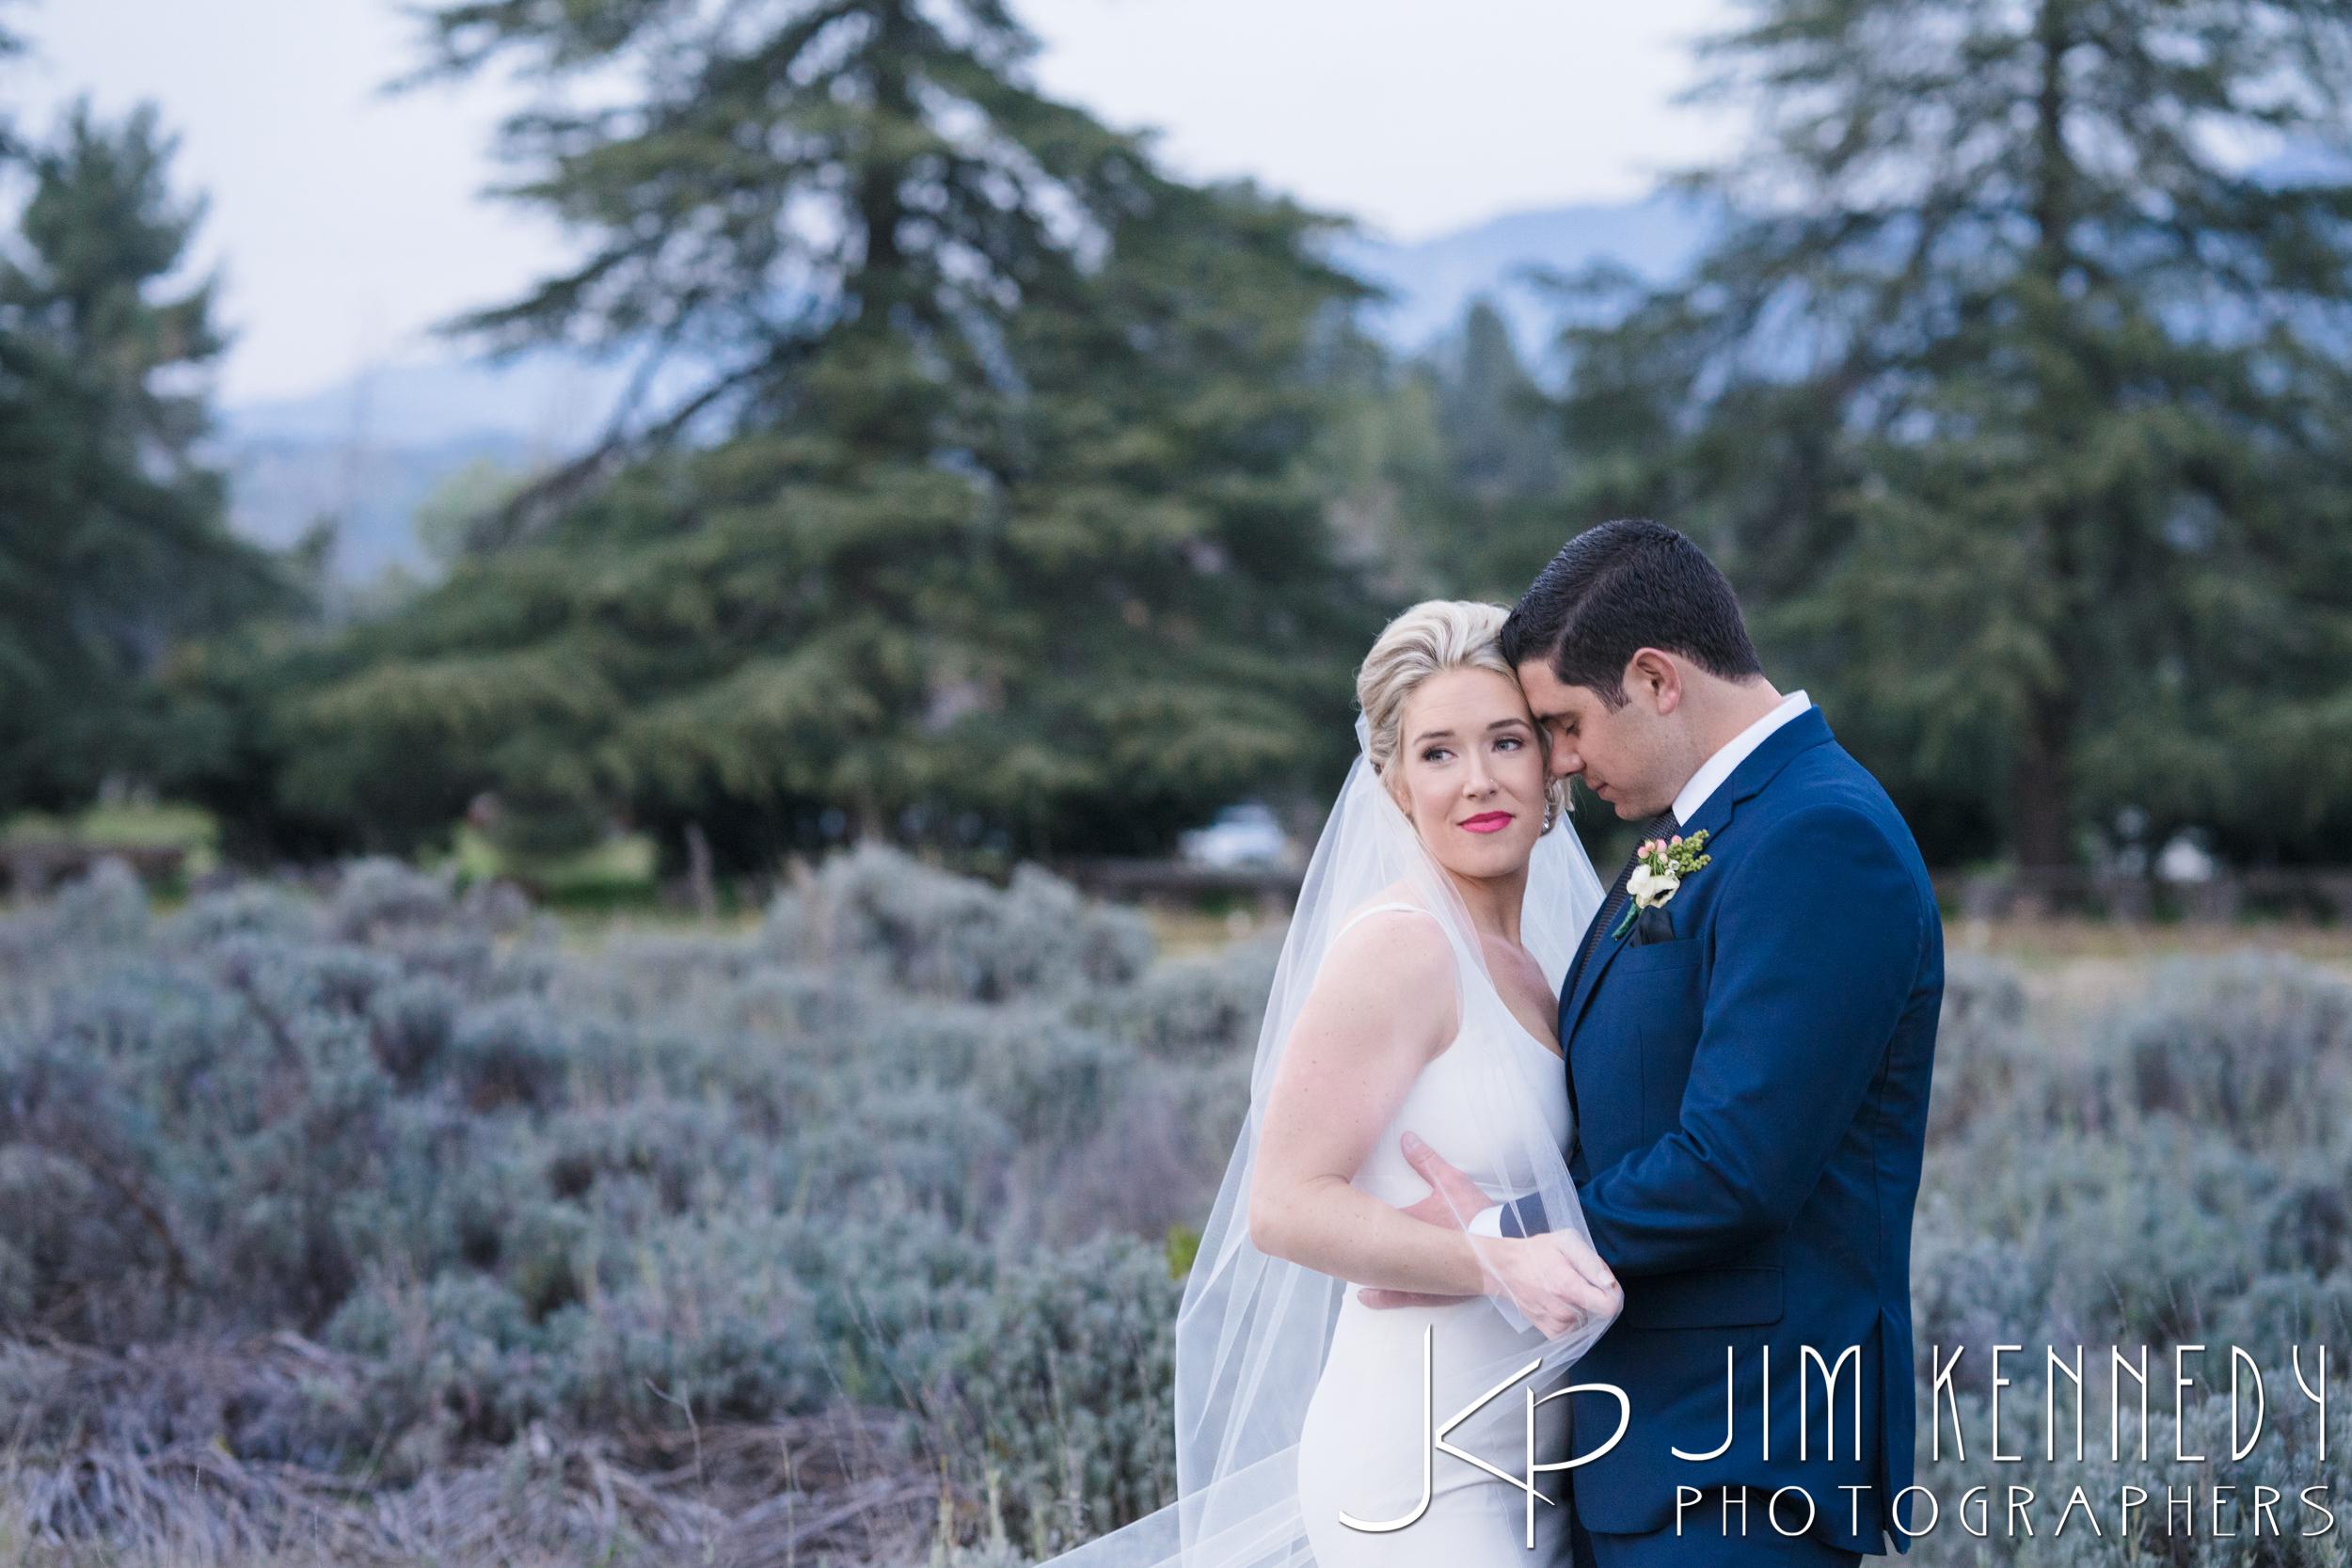 jim_kennedy_photographers_highland_springs_wedding_caitlyn_0166.jpg